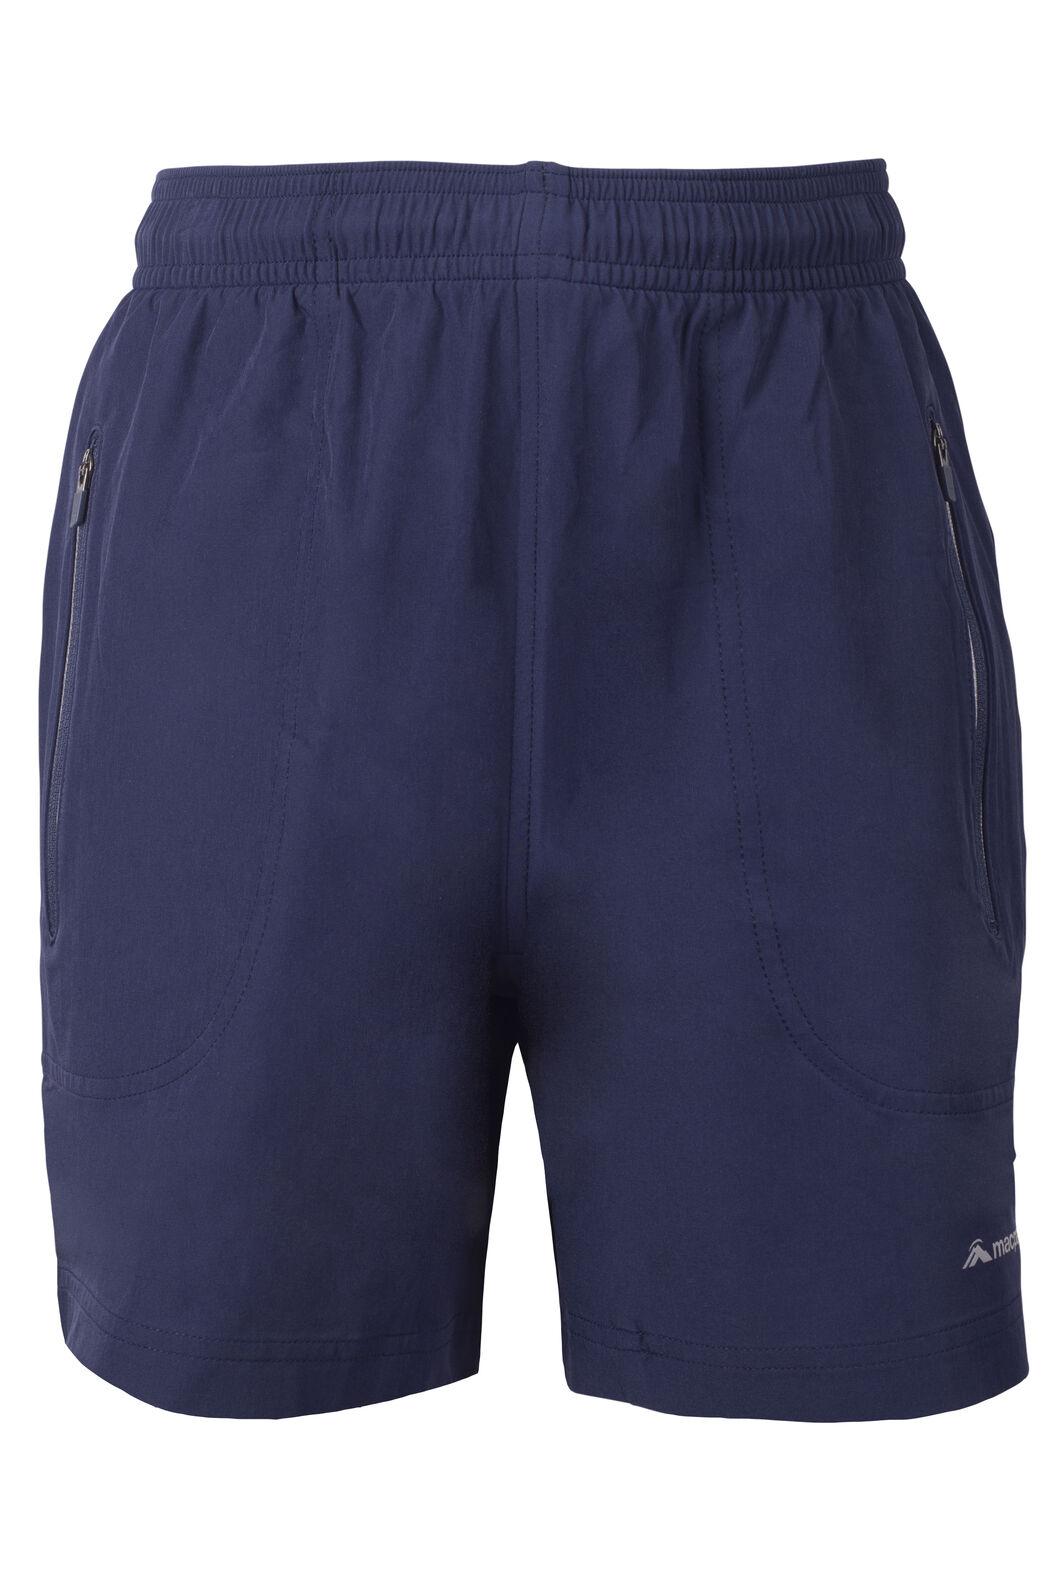 Macpac Fast Track Shorts - Kids', Black Iris, hi-res